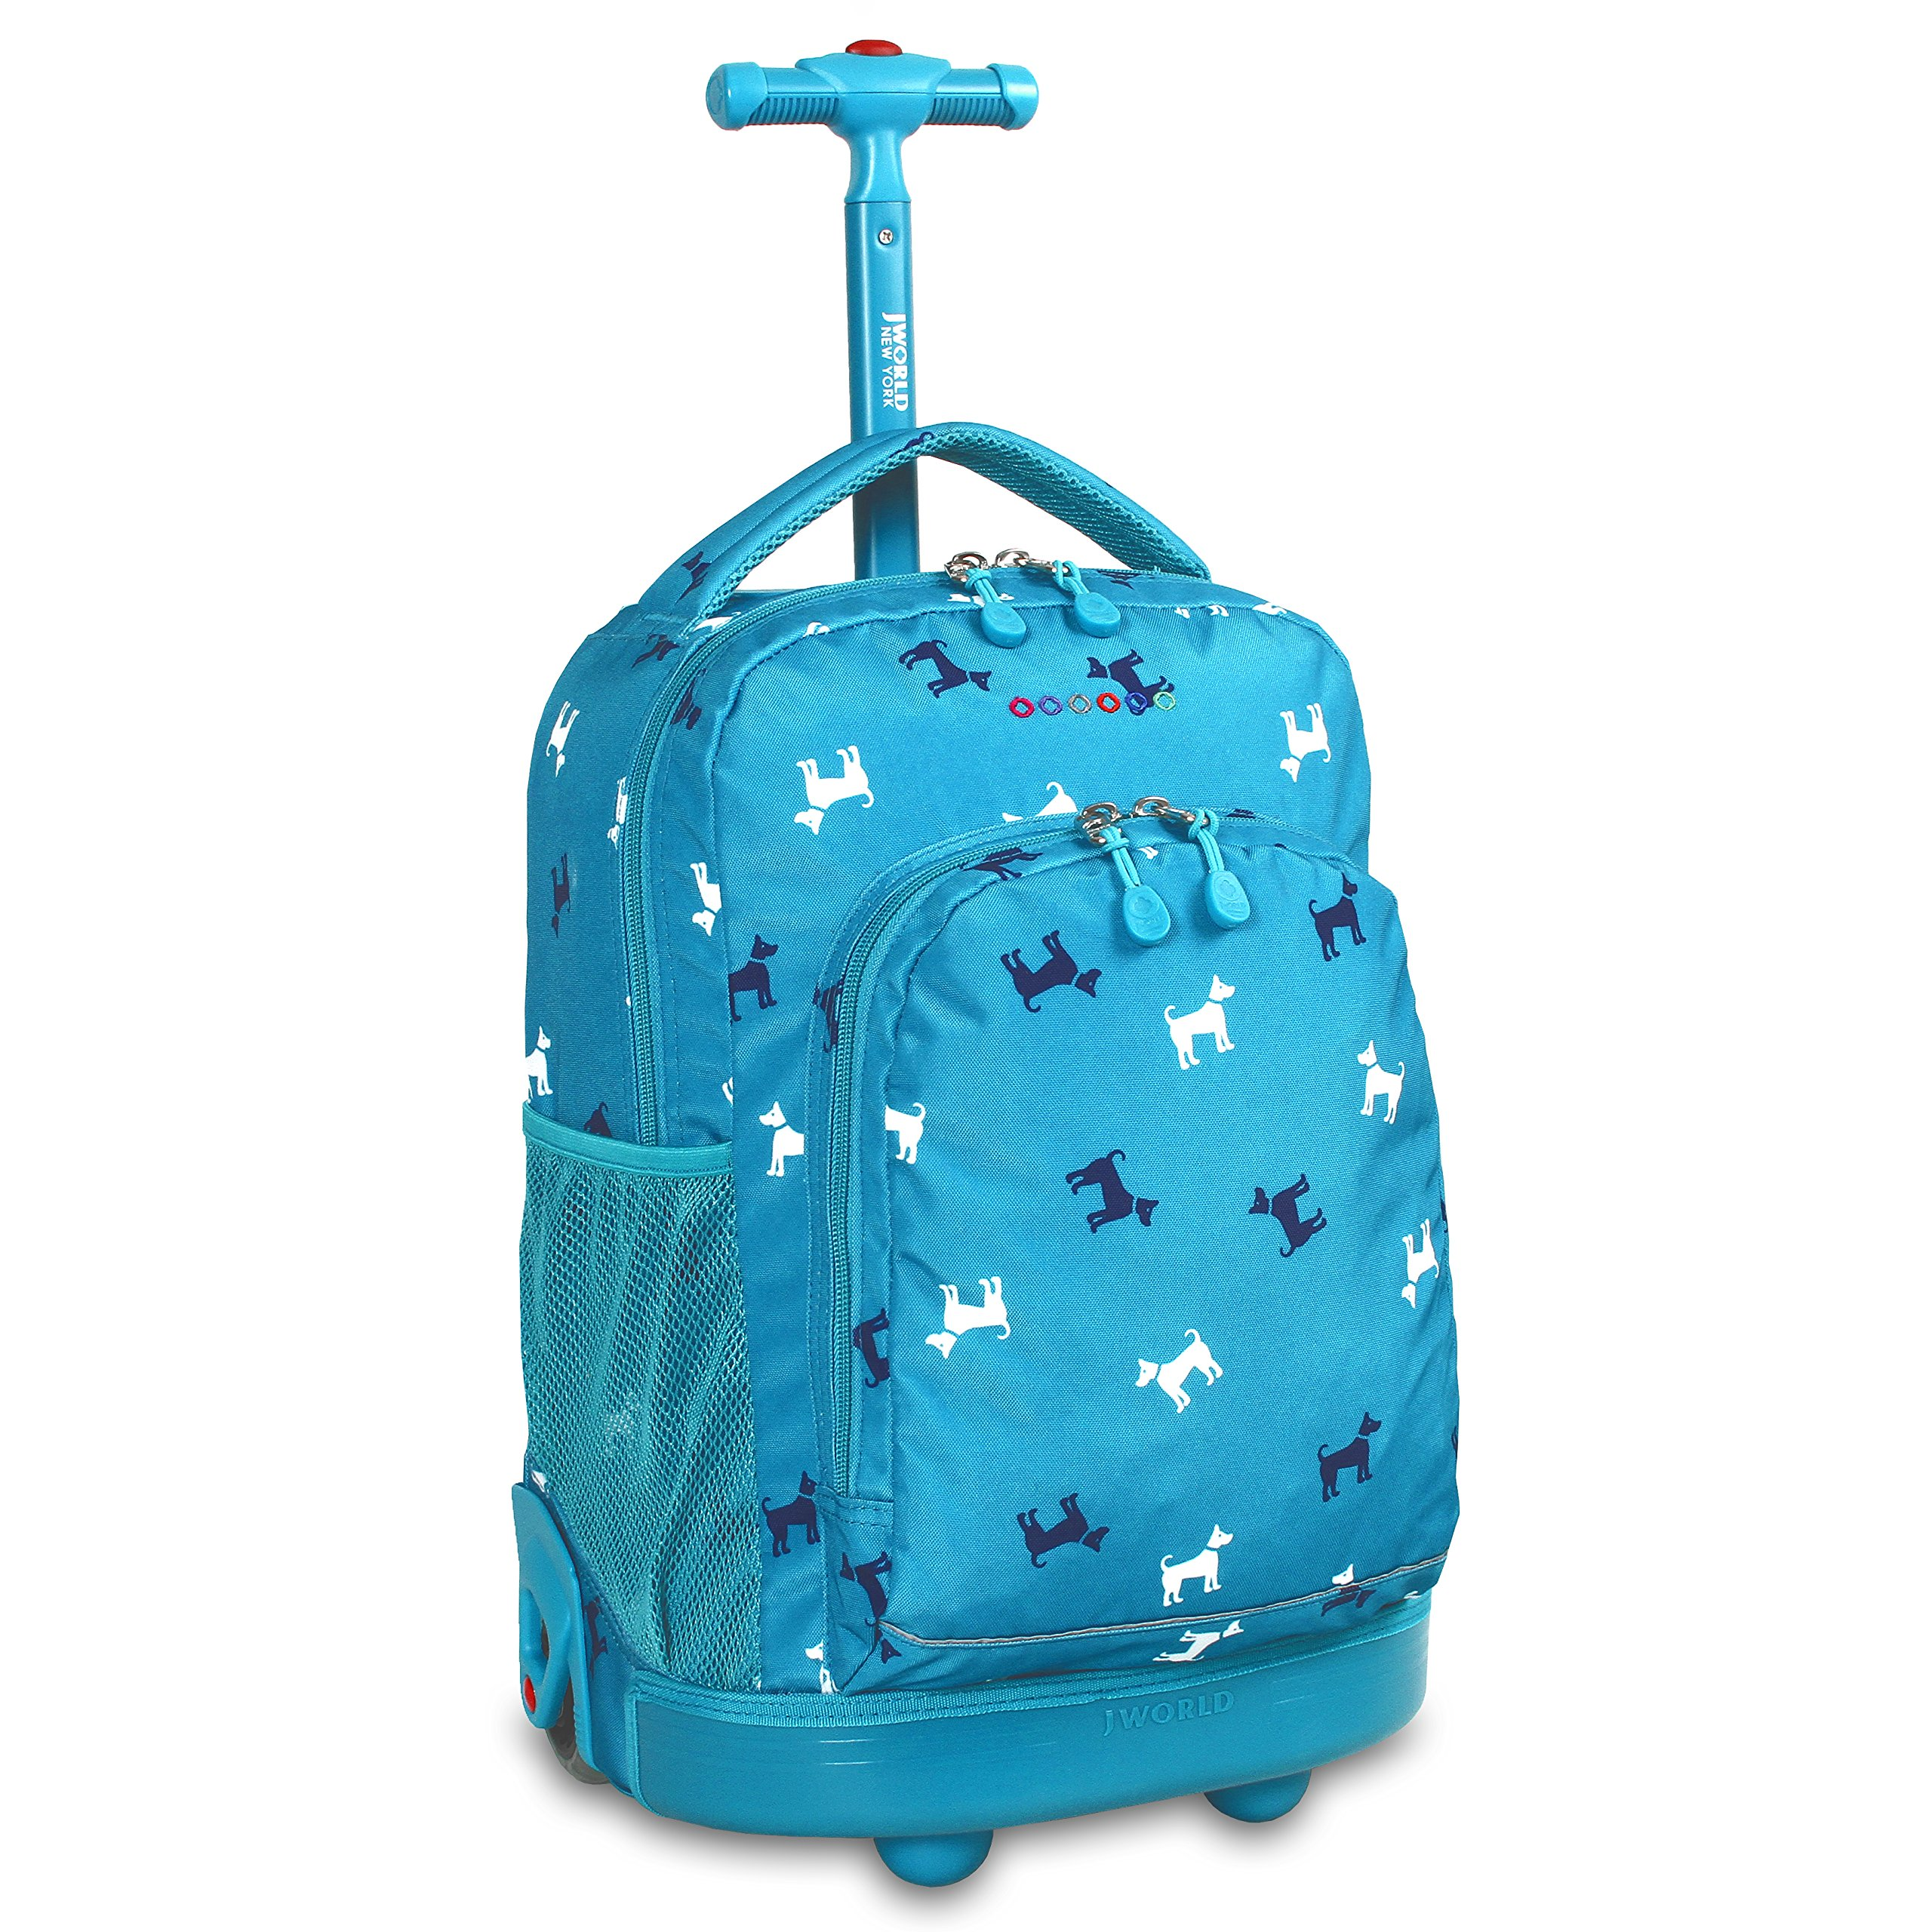 World New York Rolling Backpack